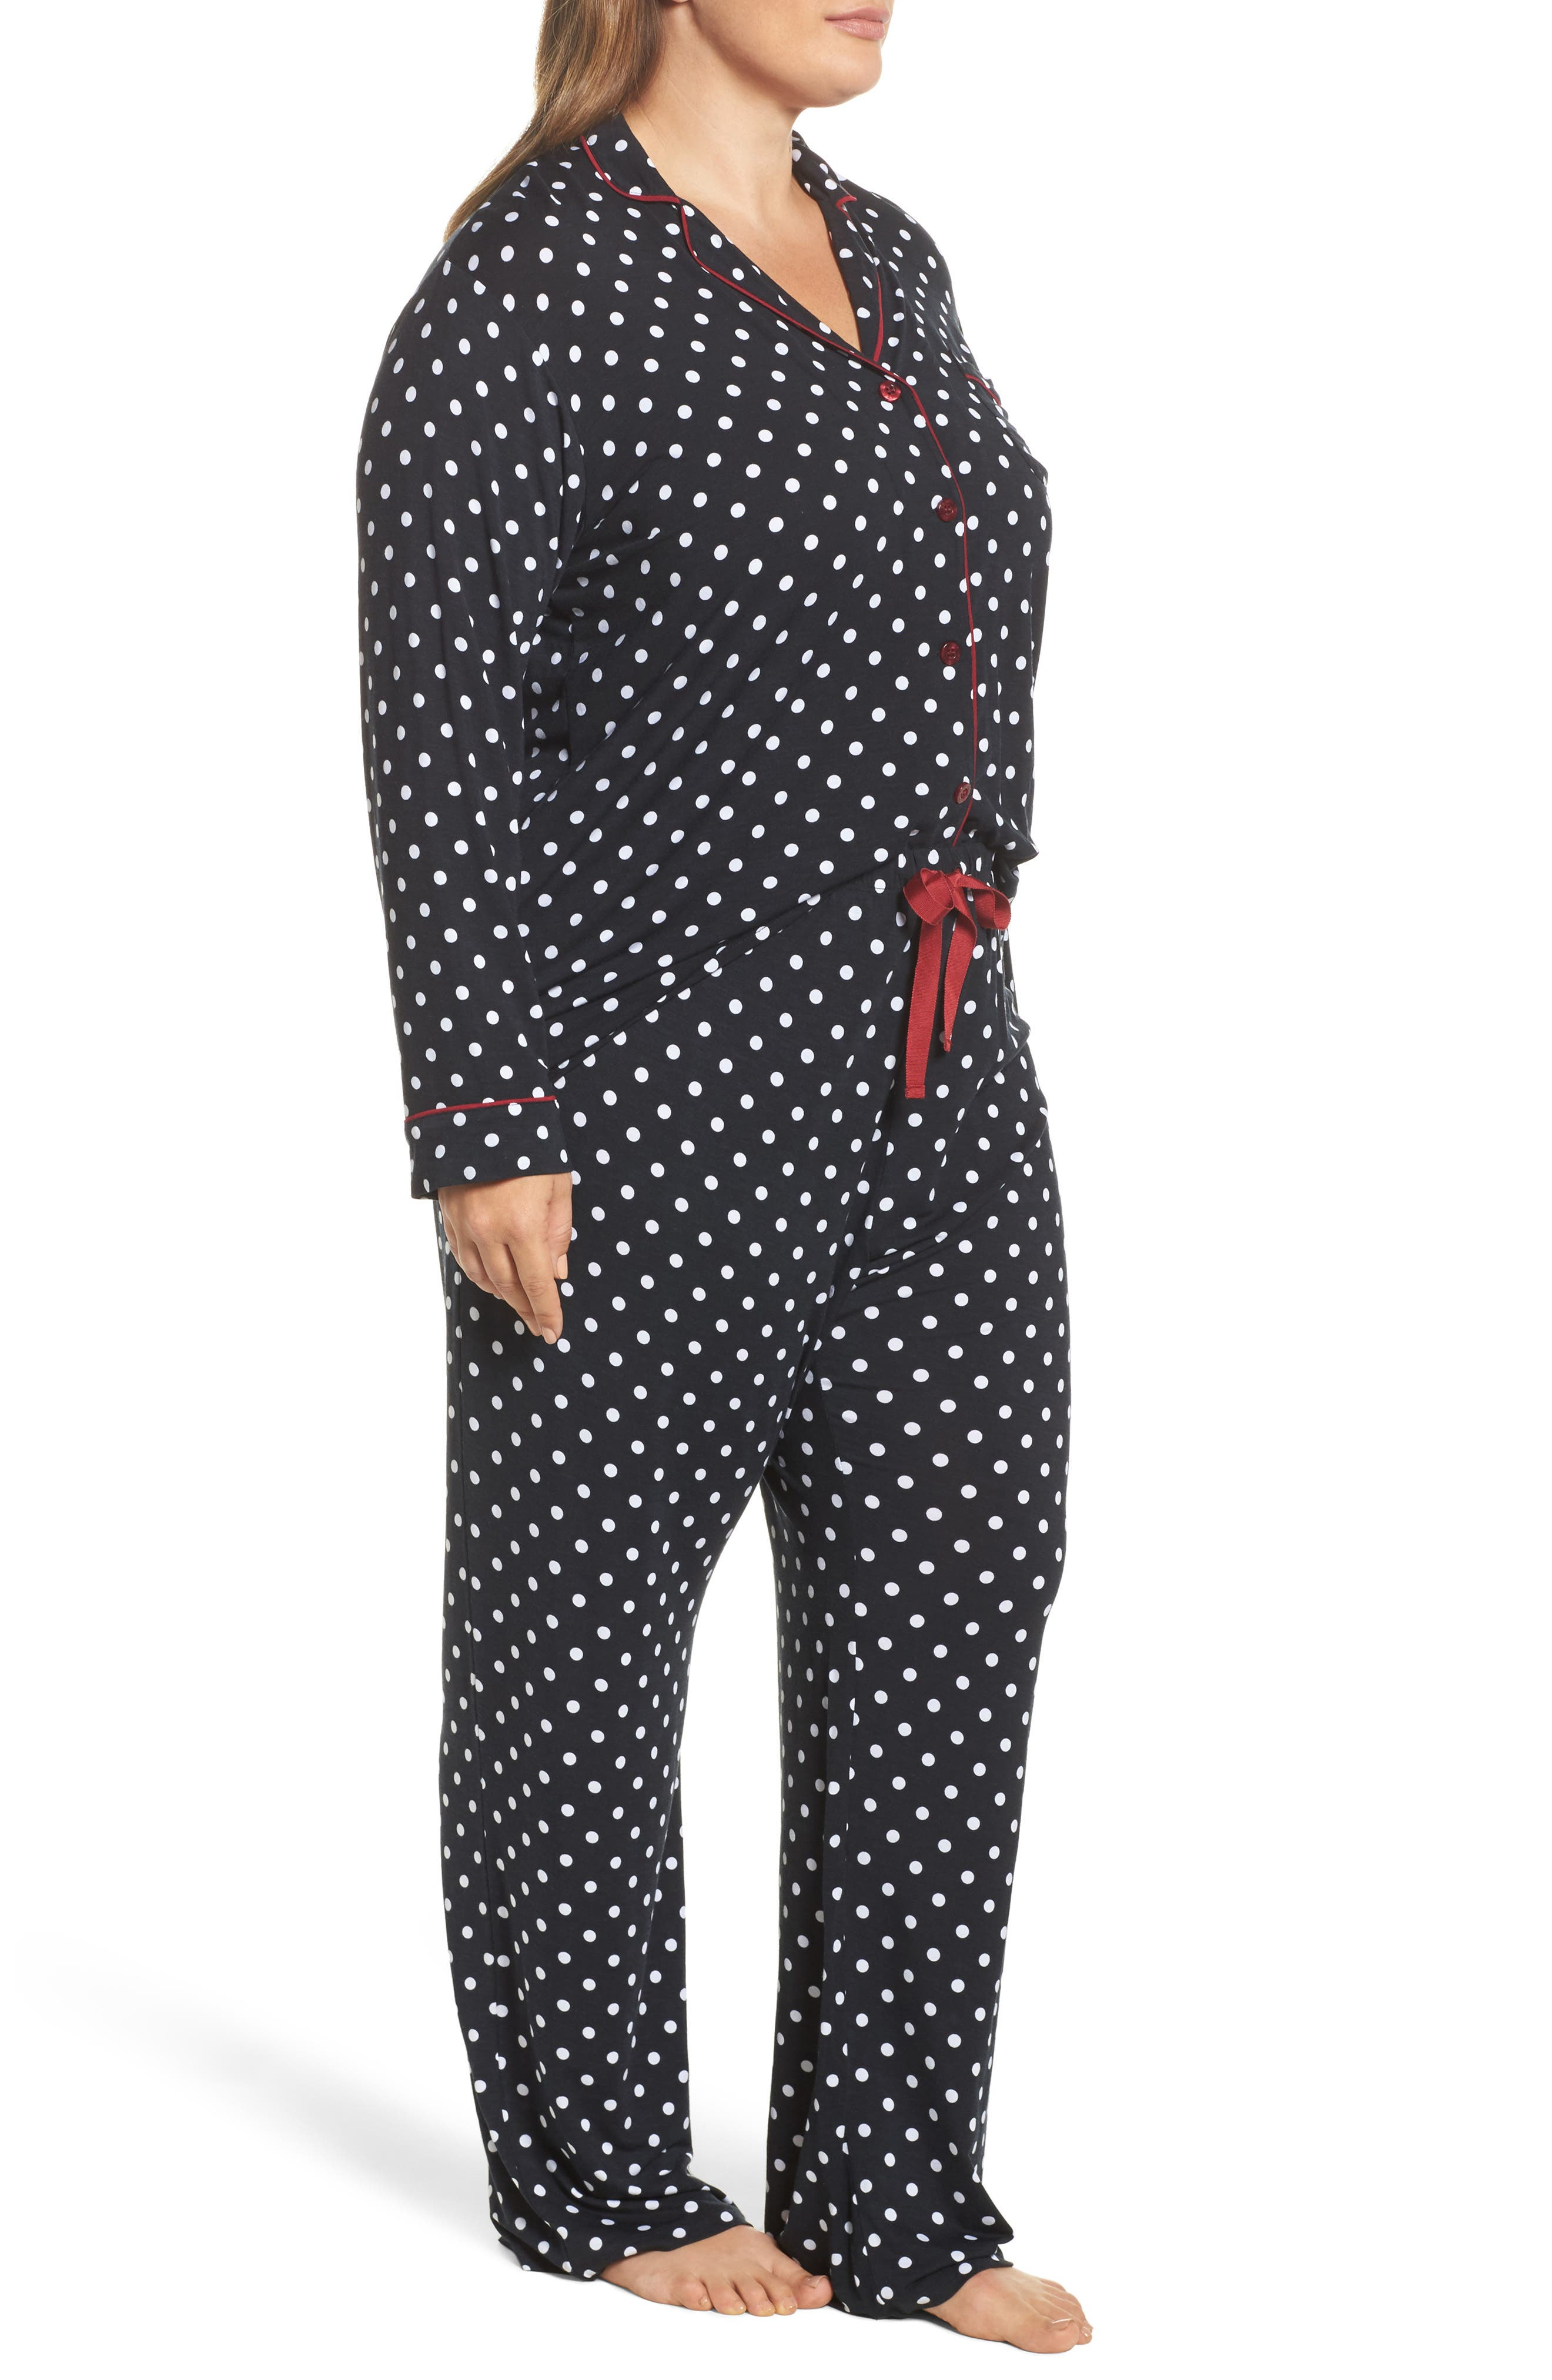 Stretch Modal Pajamas & Eye Mask,                             Alternate thumbnail 3, color,                             001